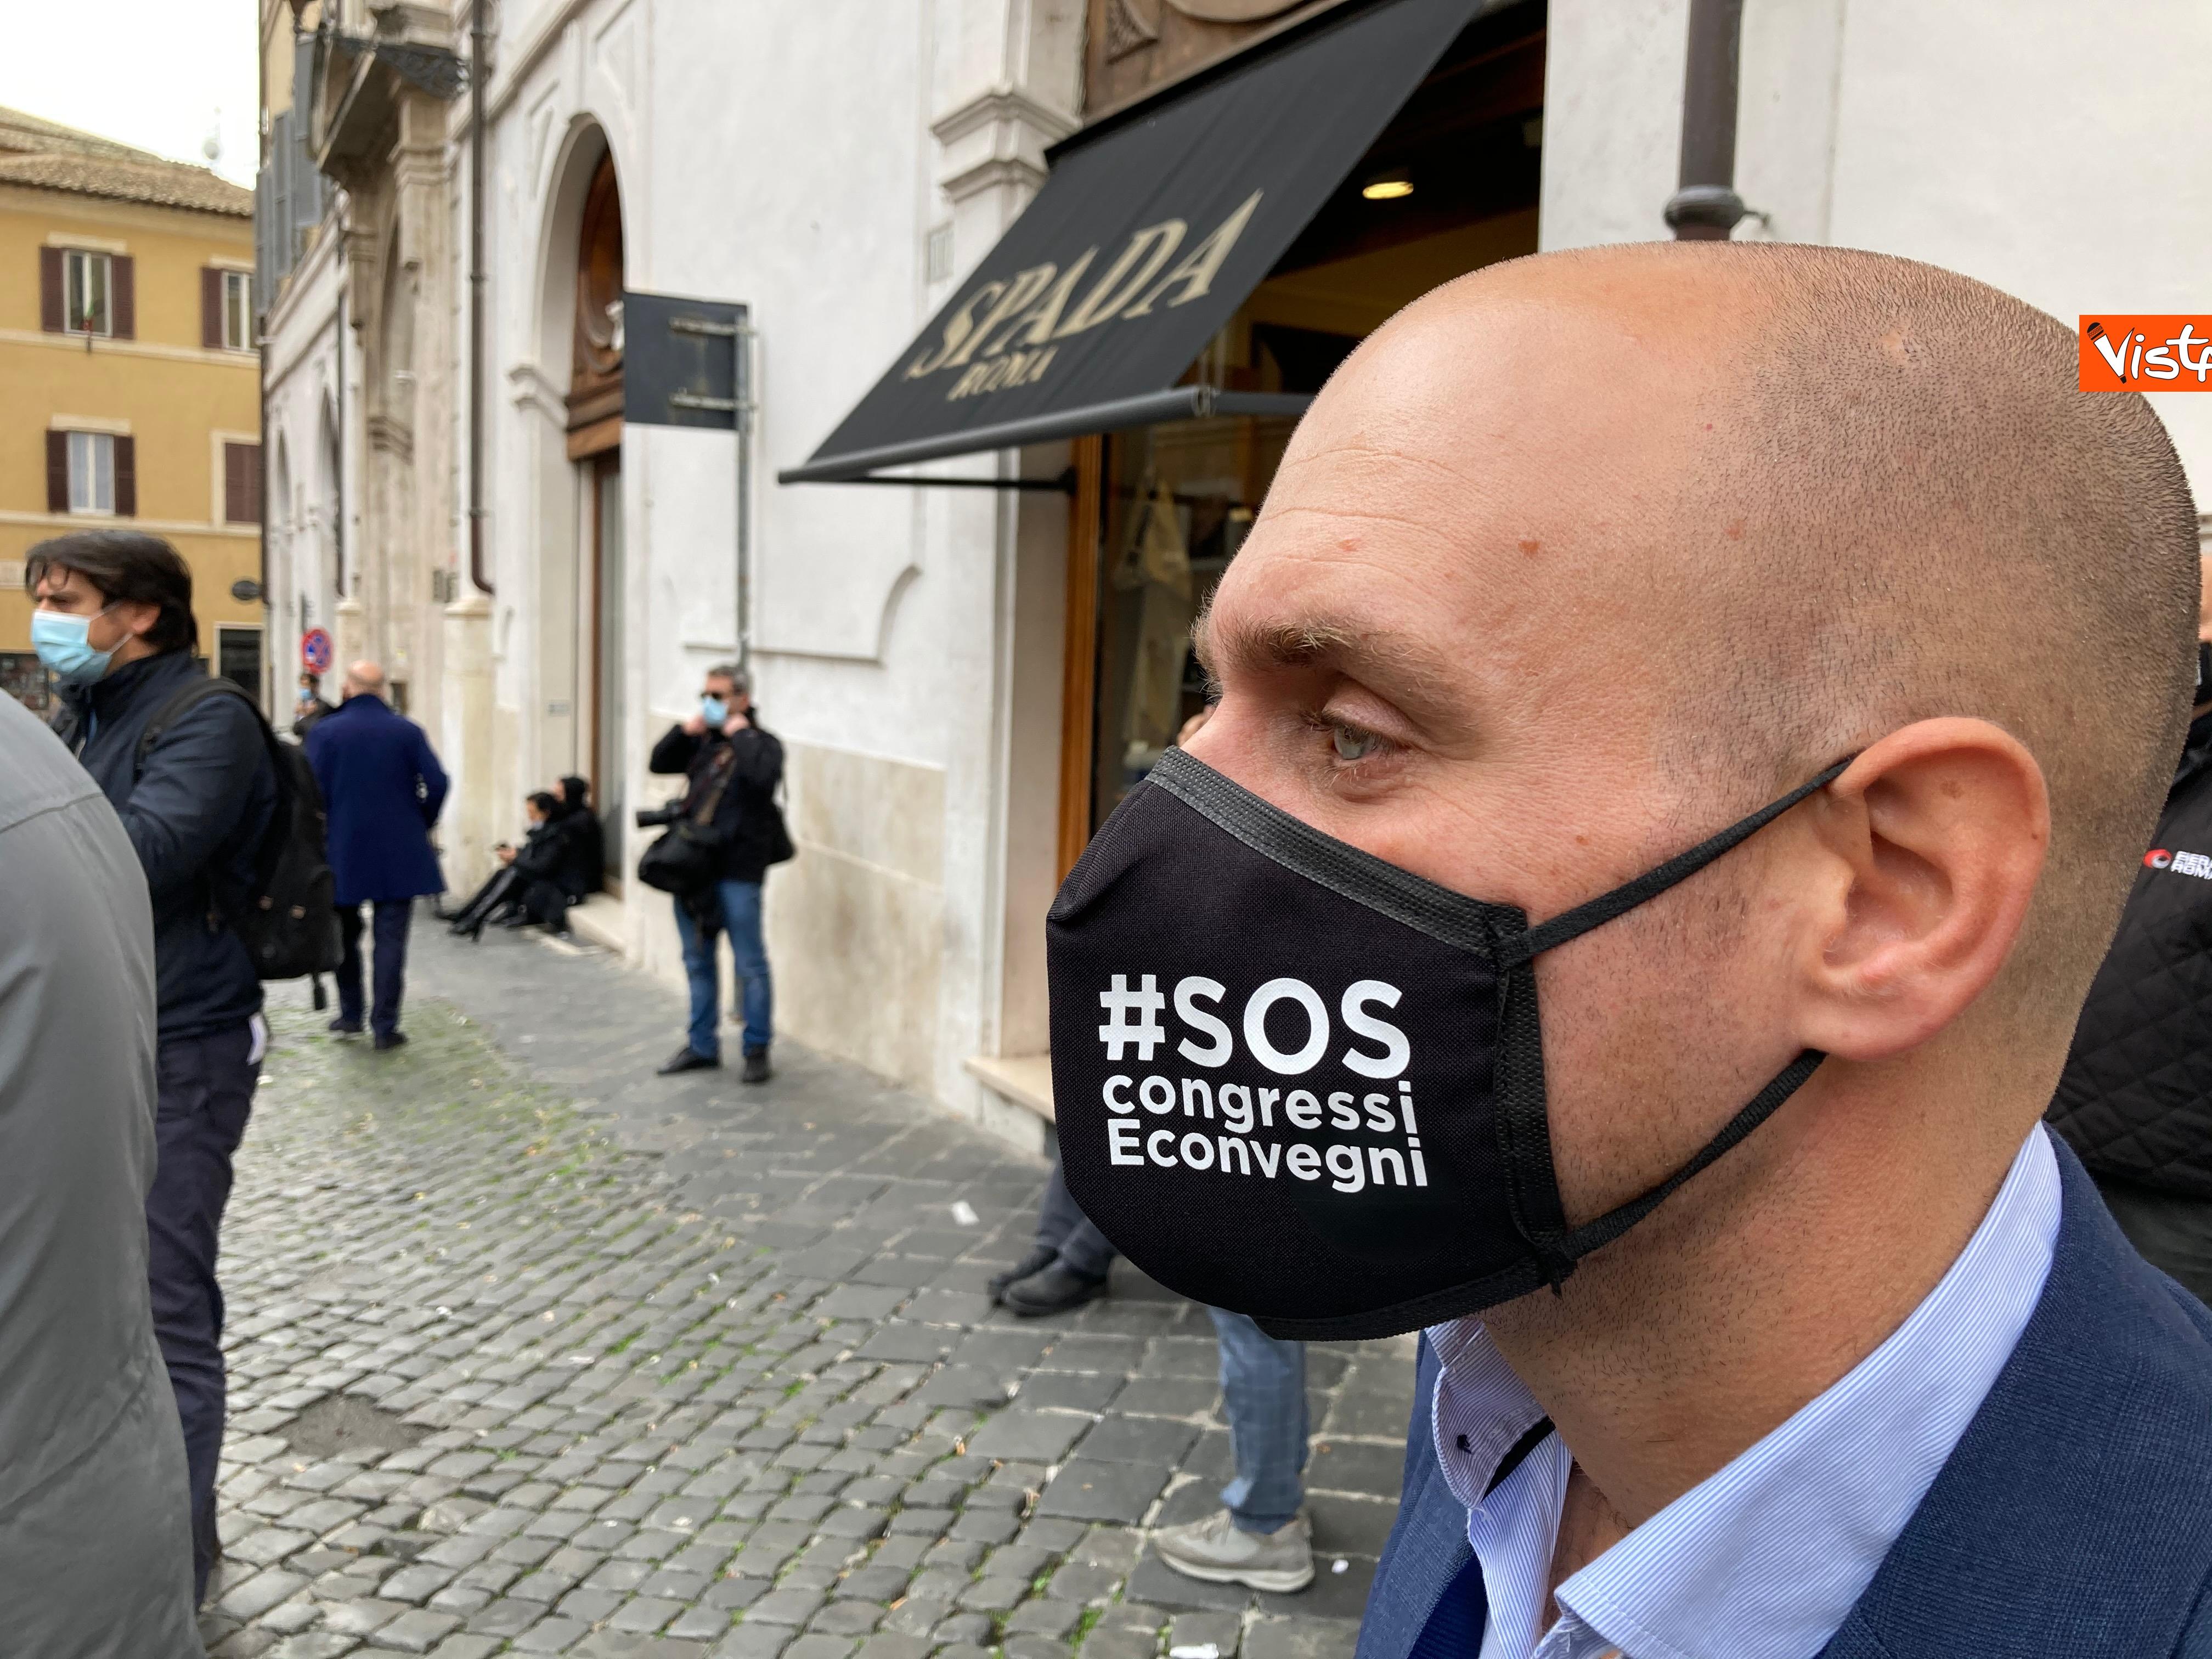 La mascherina a tema di un manifestante